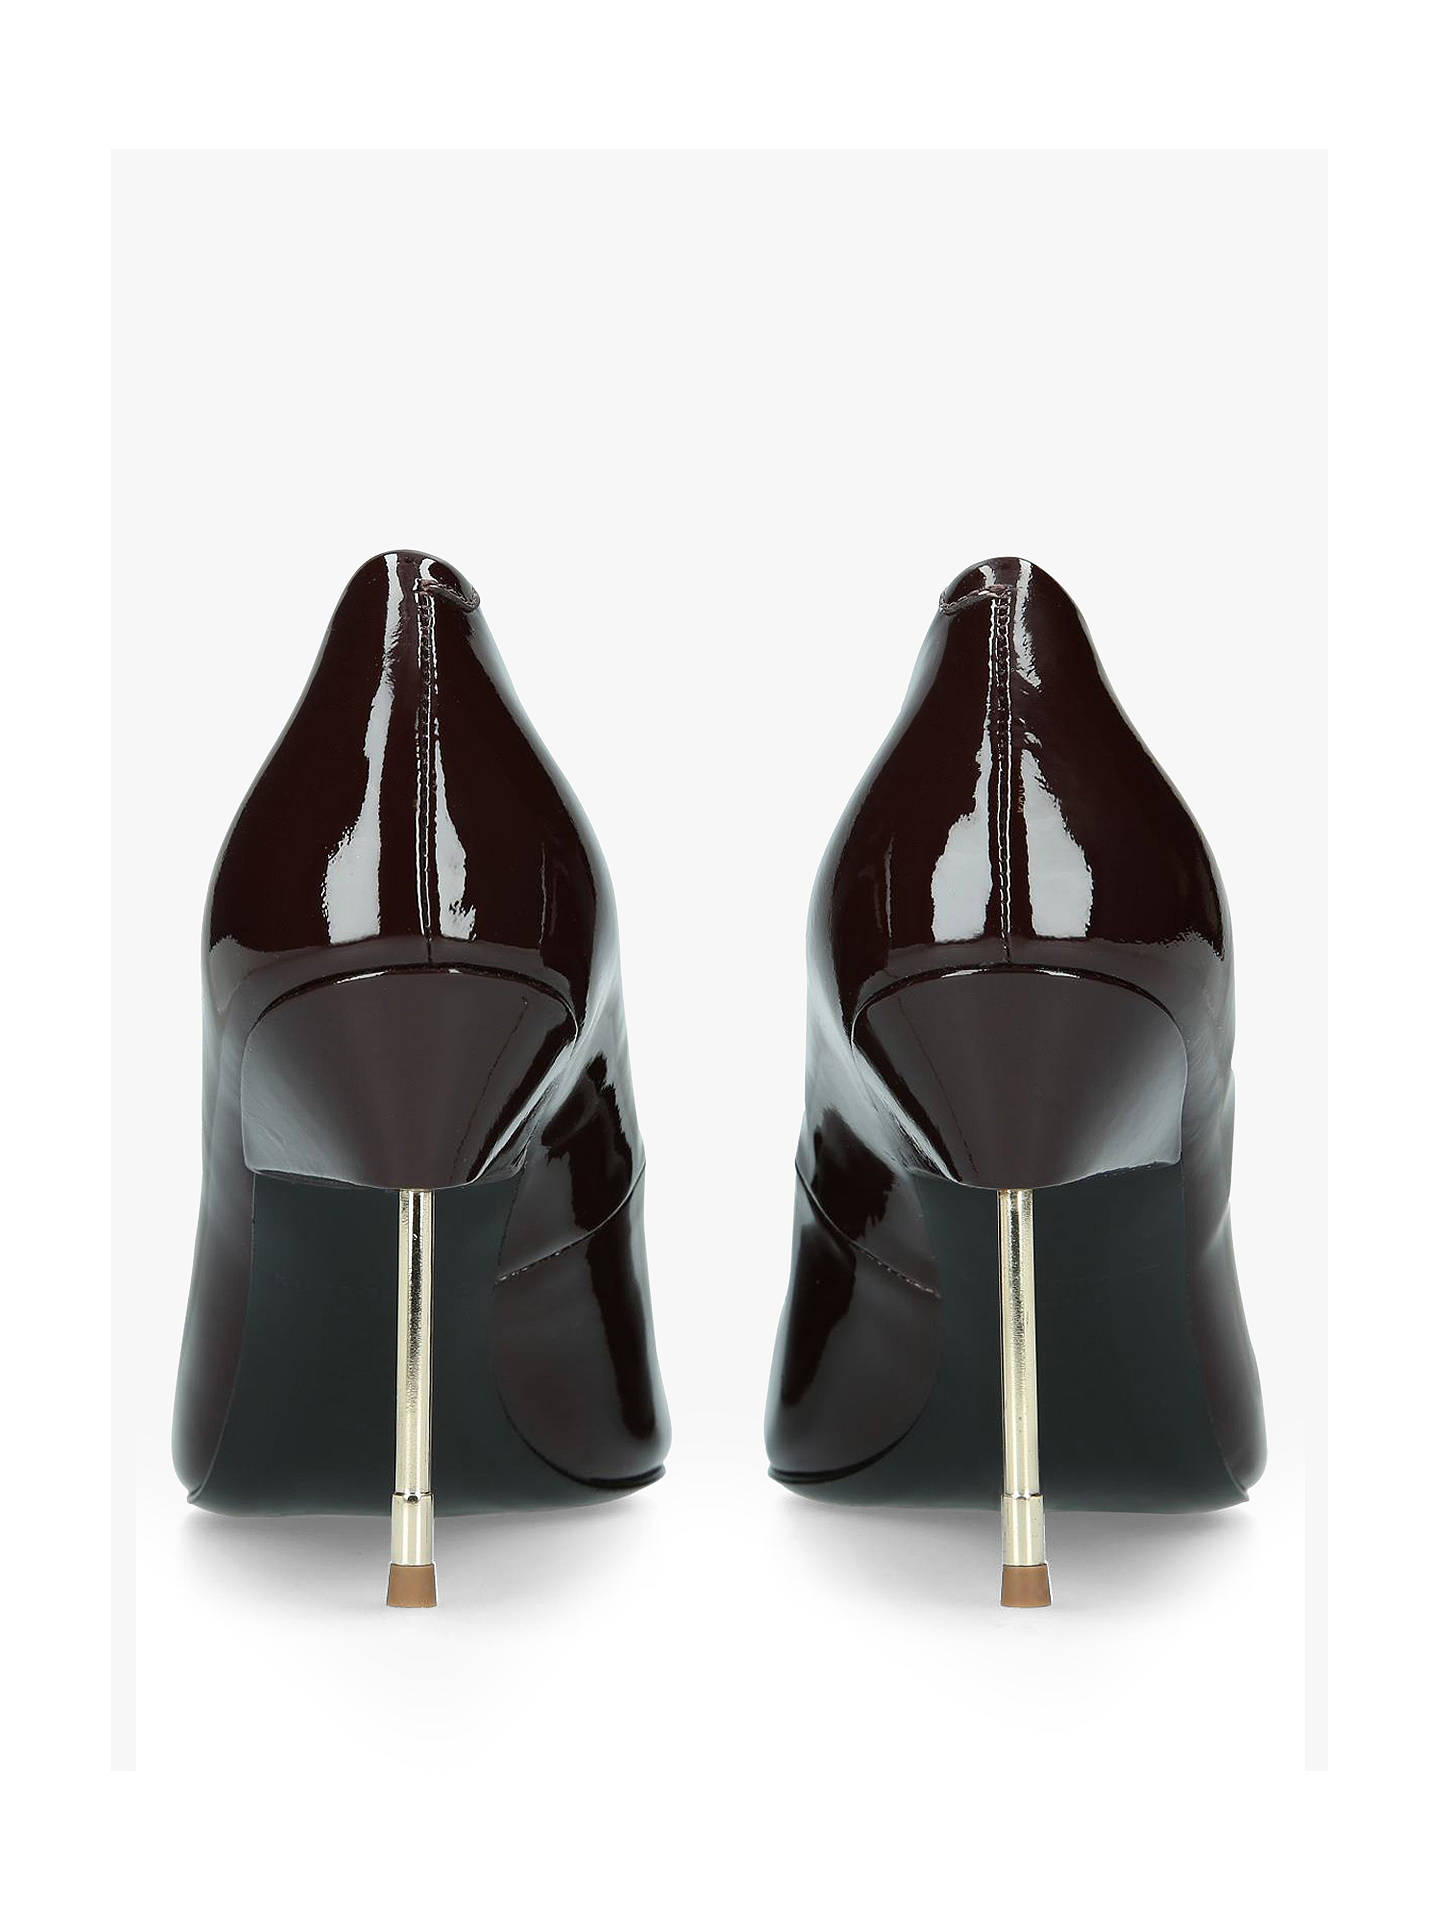 08a0542a19d Kurt Geiger London Britton Court Shoes, Red Wine Patent at John ...